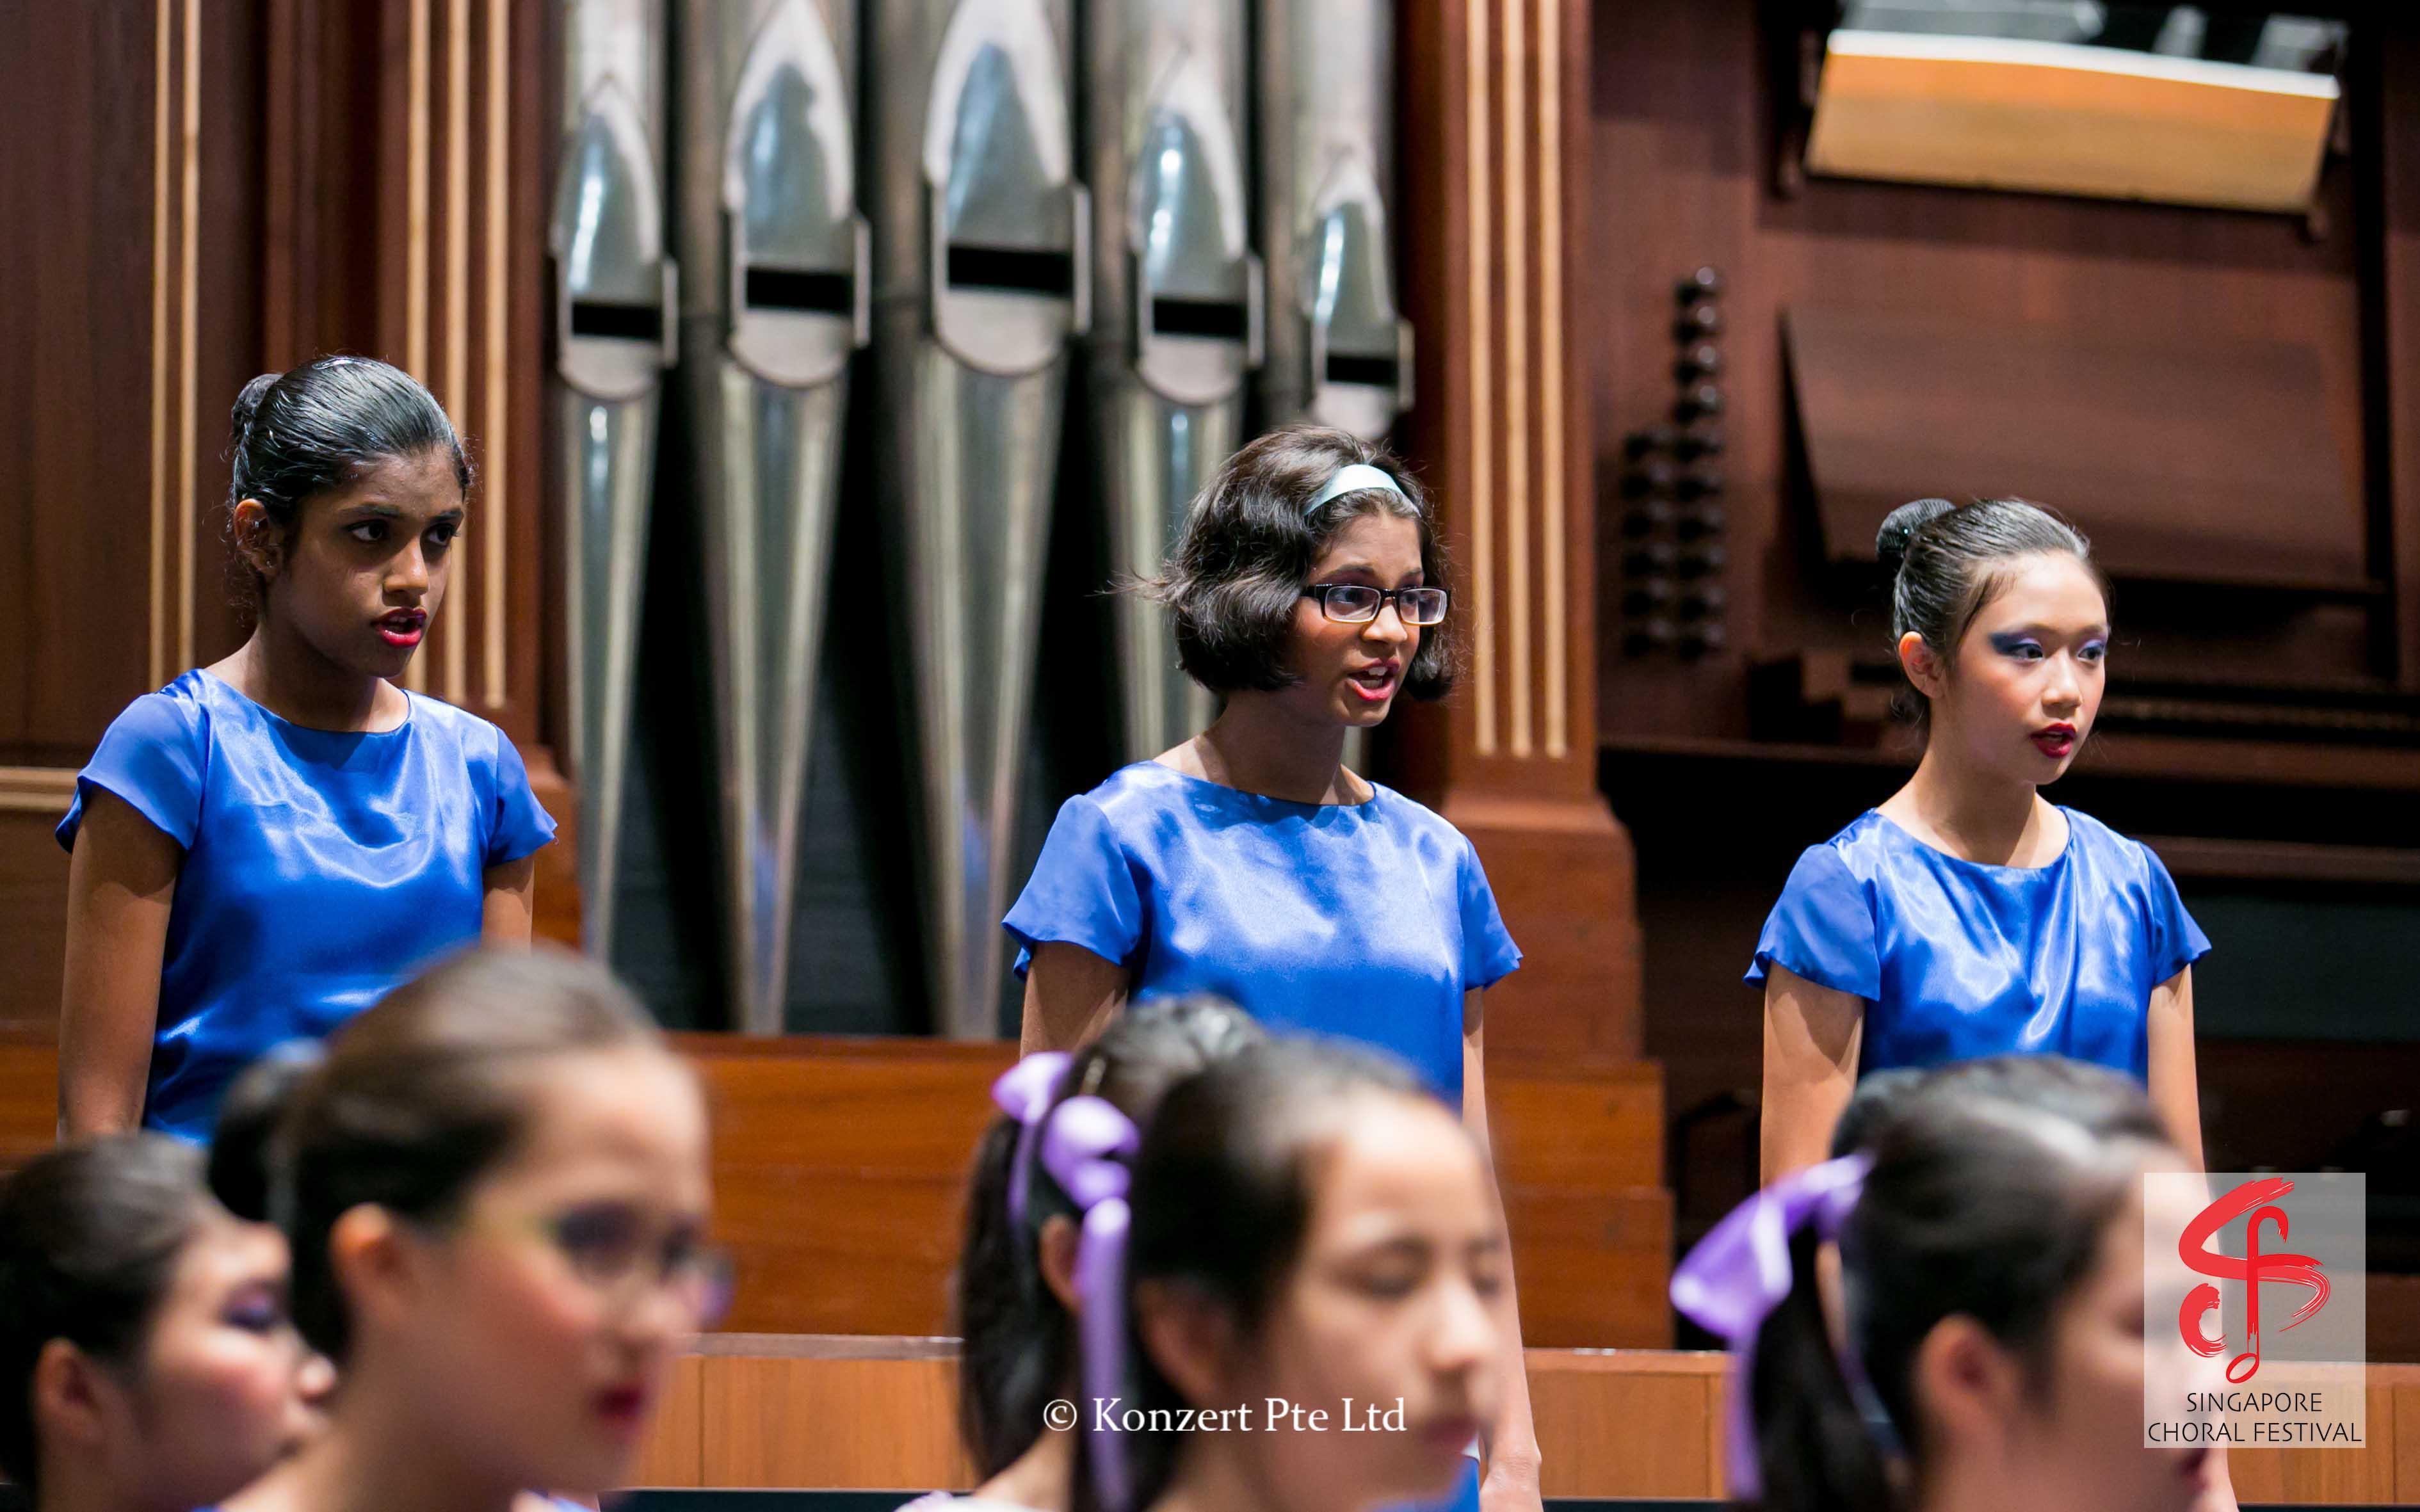 Singapore Choral Festival 7-8-15 (87).jpg